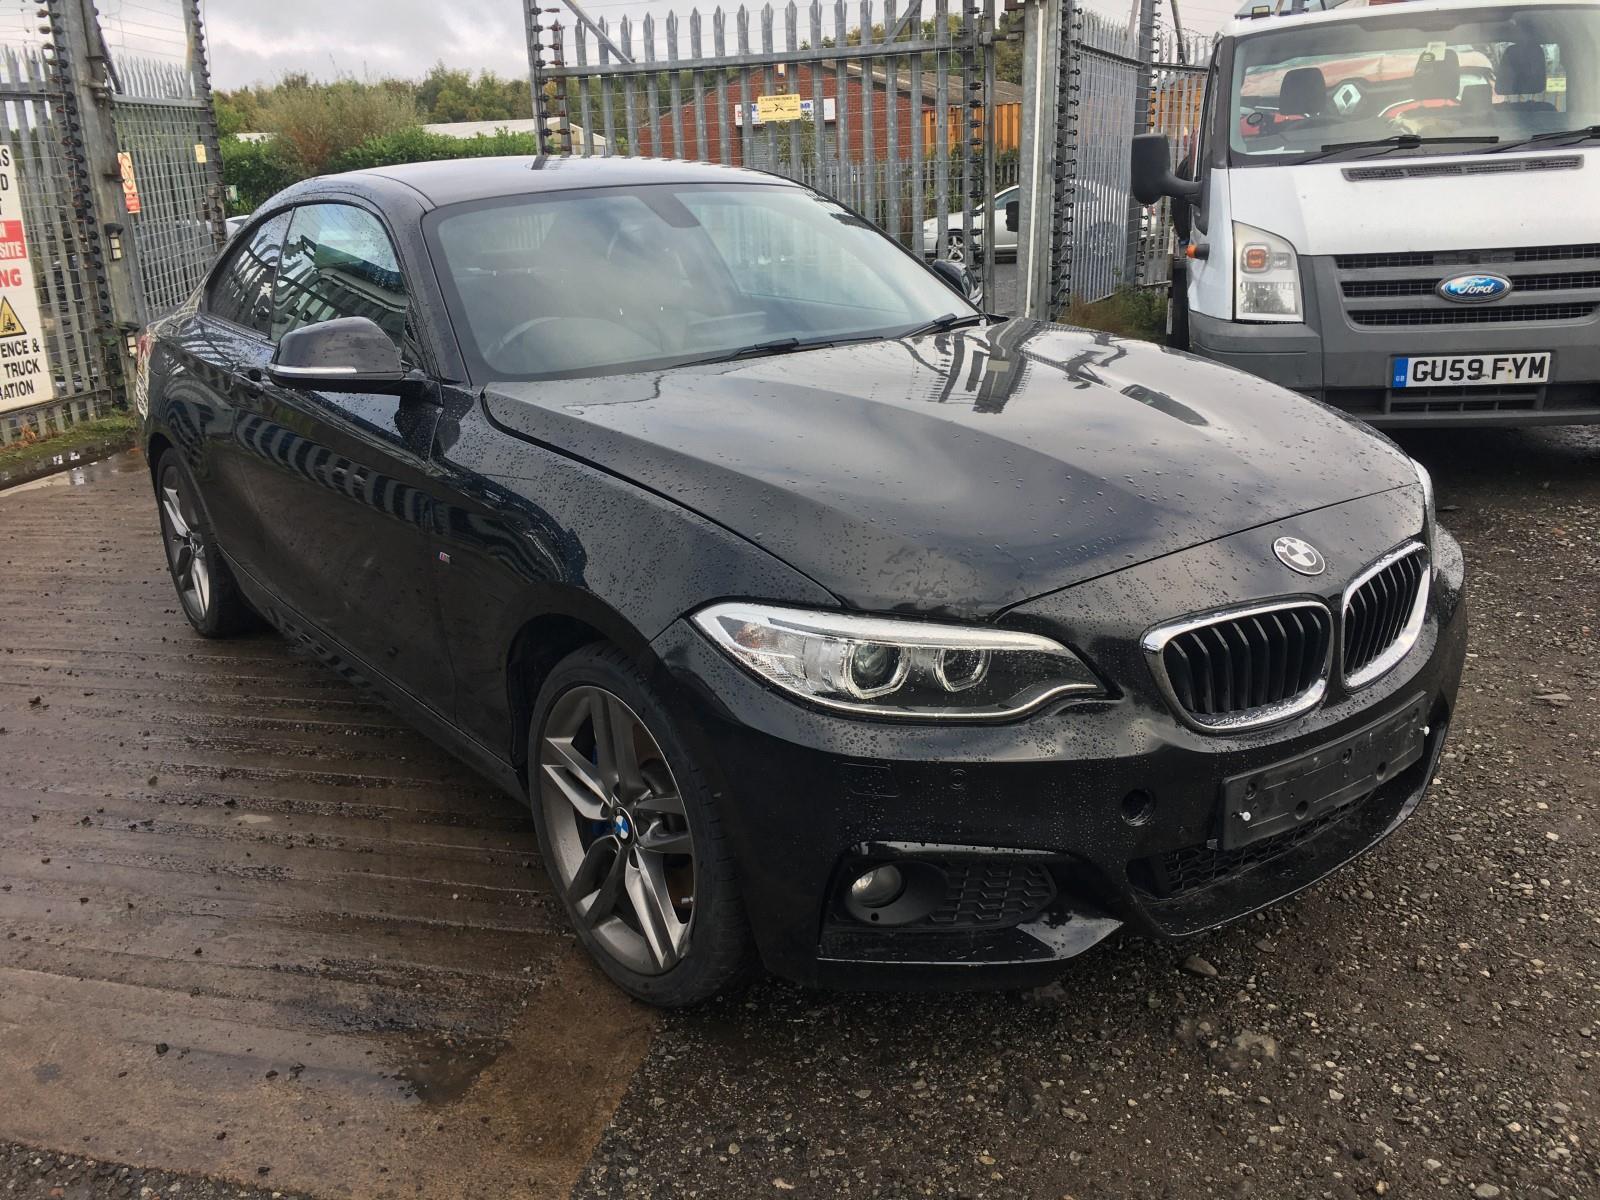 2015 BMW 2 SERIES 225D M SPORT 1995cc TURBO DIESEL AUTOMATIC 2 DOOR COUPE